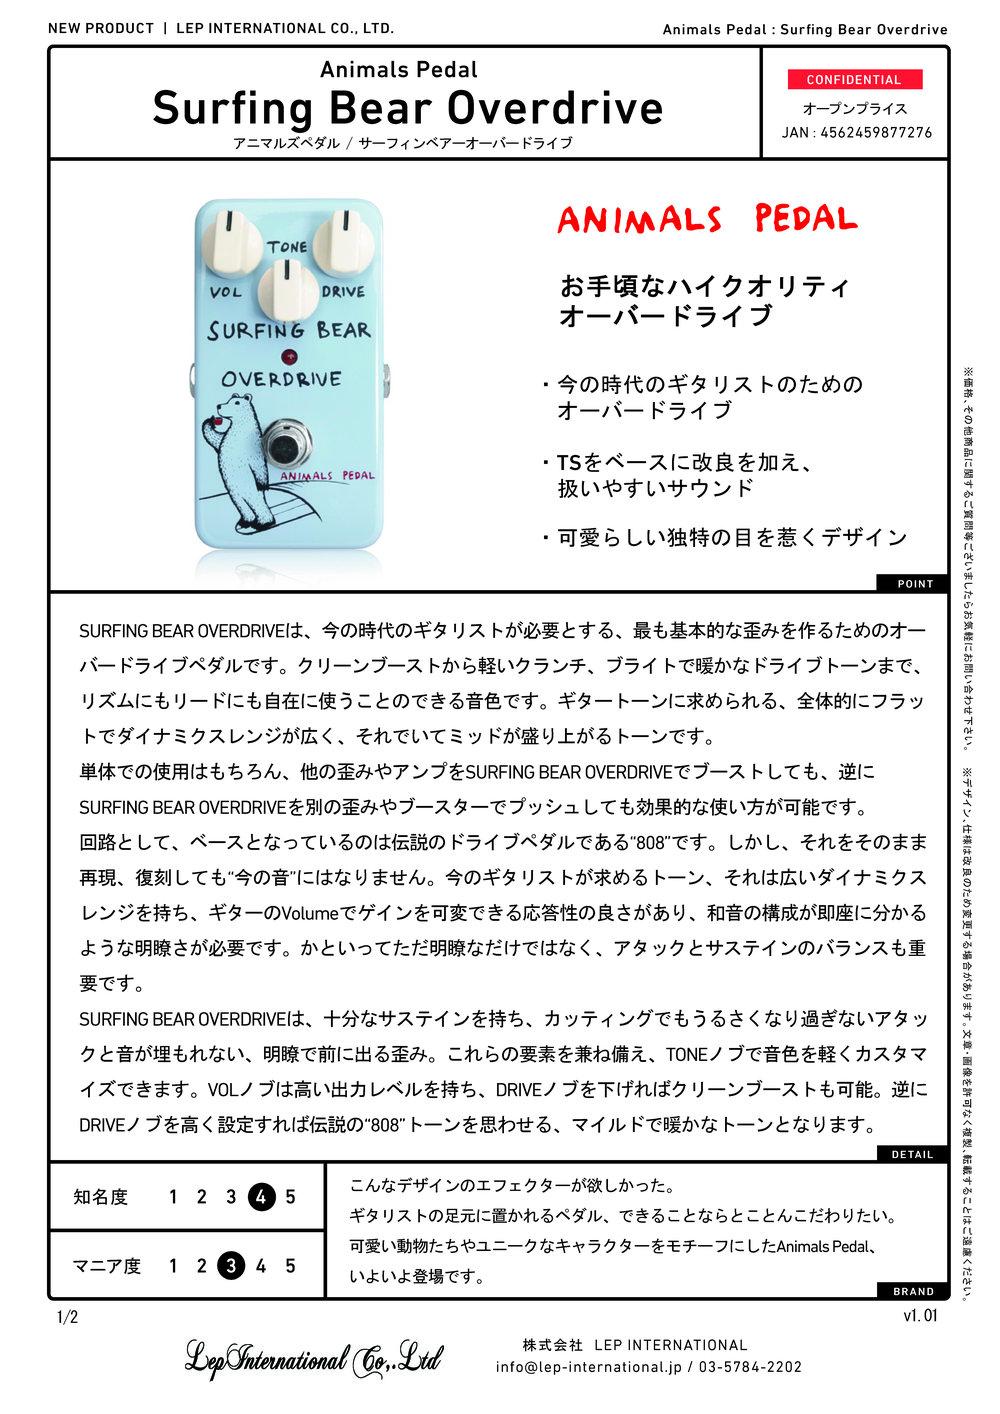 animalspedal surfingbearoverdrive v1.01_ページ_1.jpg